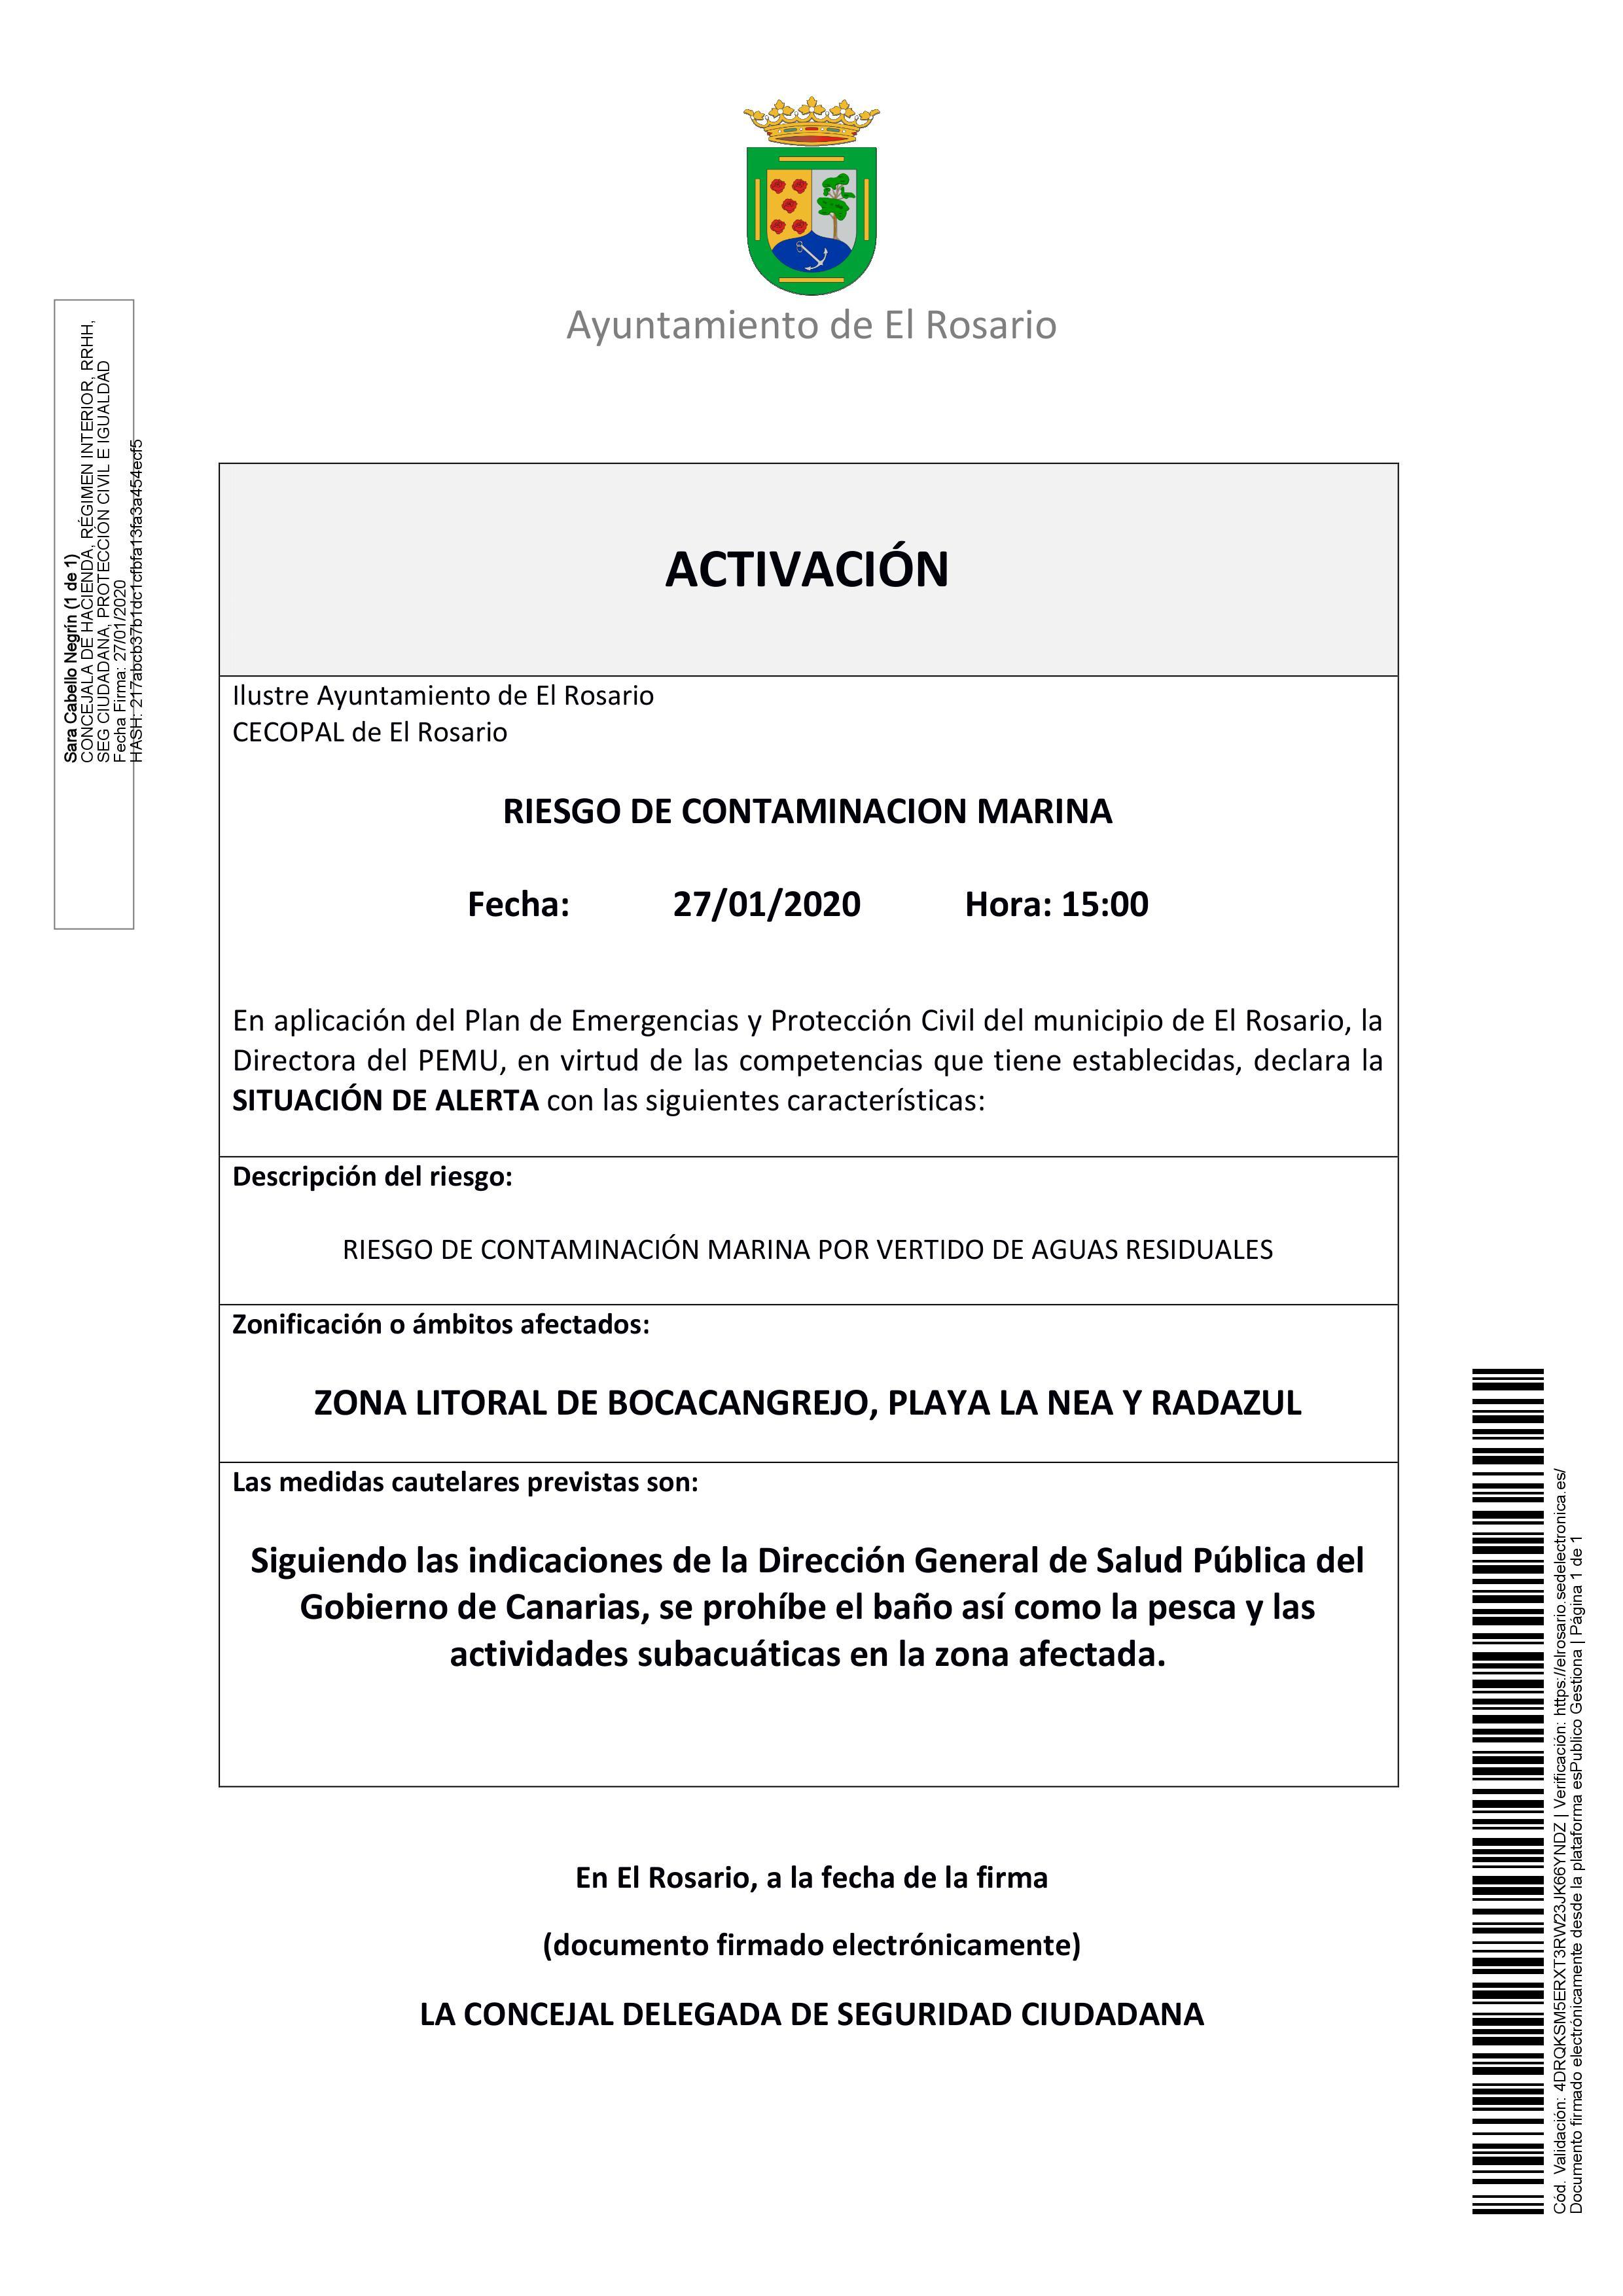 20200127_Informe_Informe_ACTIVACIÓN DEL PLAN DE EMERGENCIAS MUNICIPAL